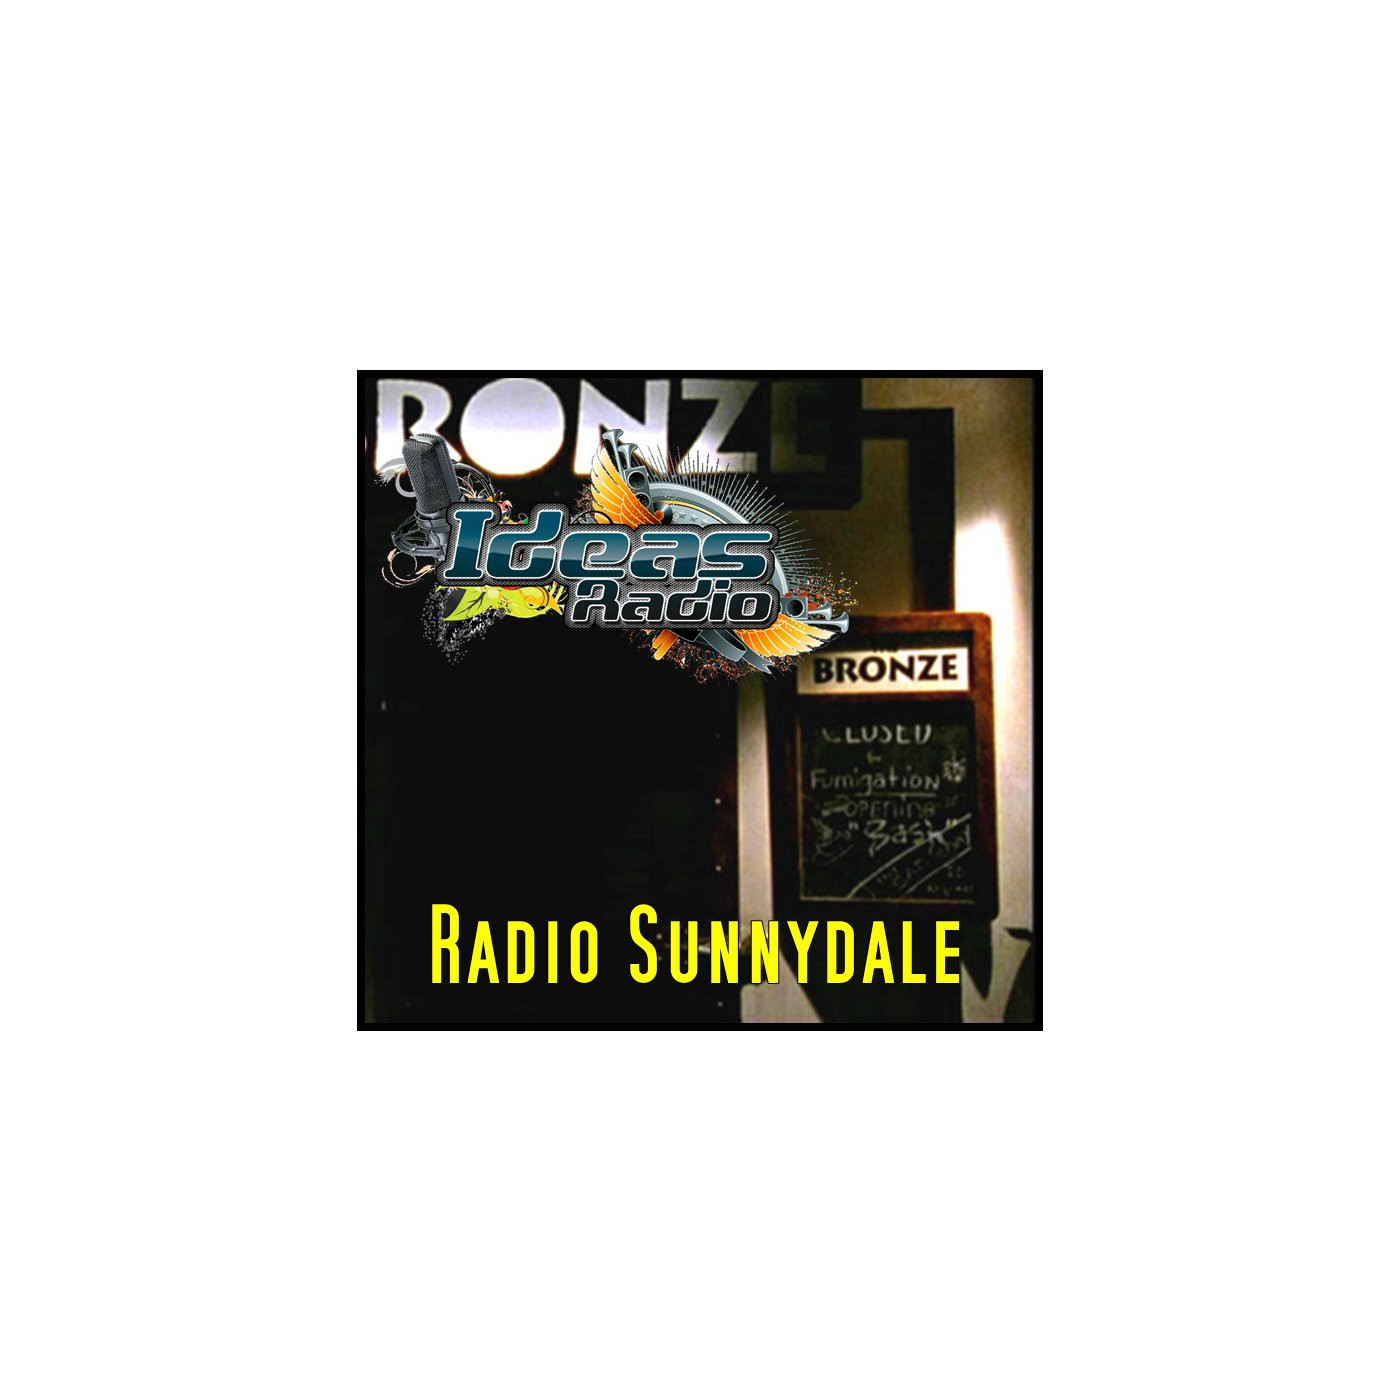 Radio Sunnydale